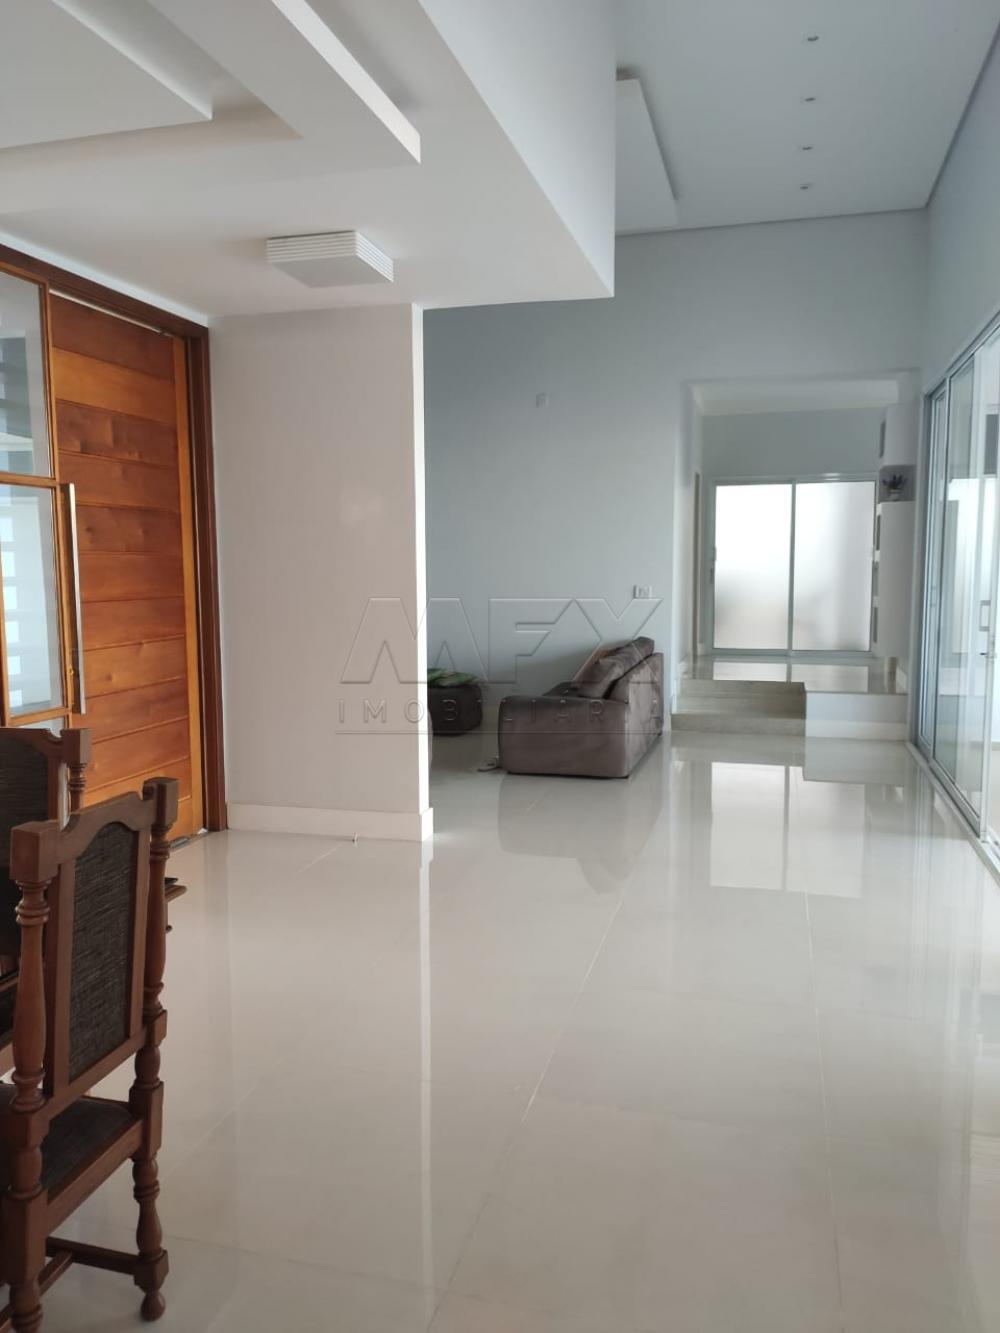 Comprar Casa / Condomínio em Bauru apenas R$ 1.800.000,00 - Foto 6